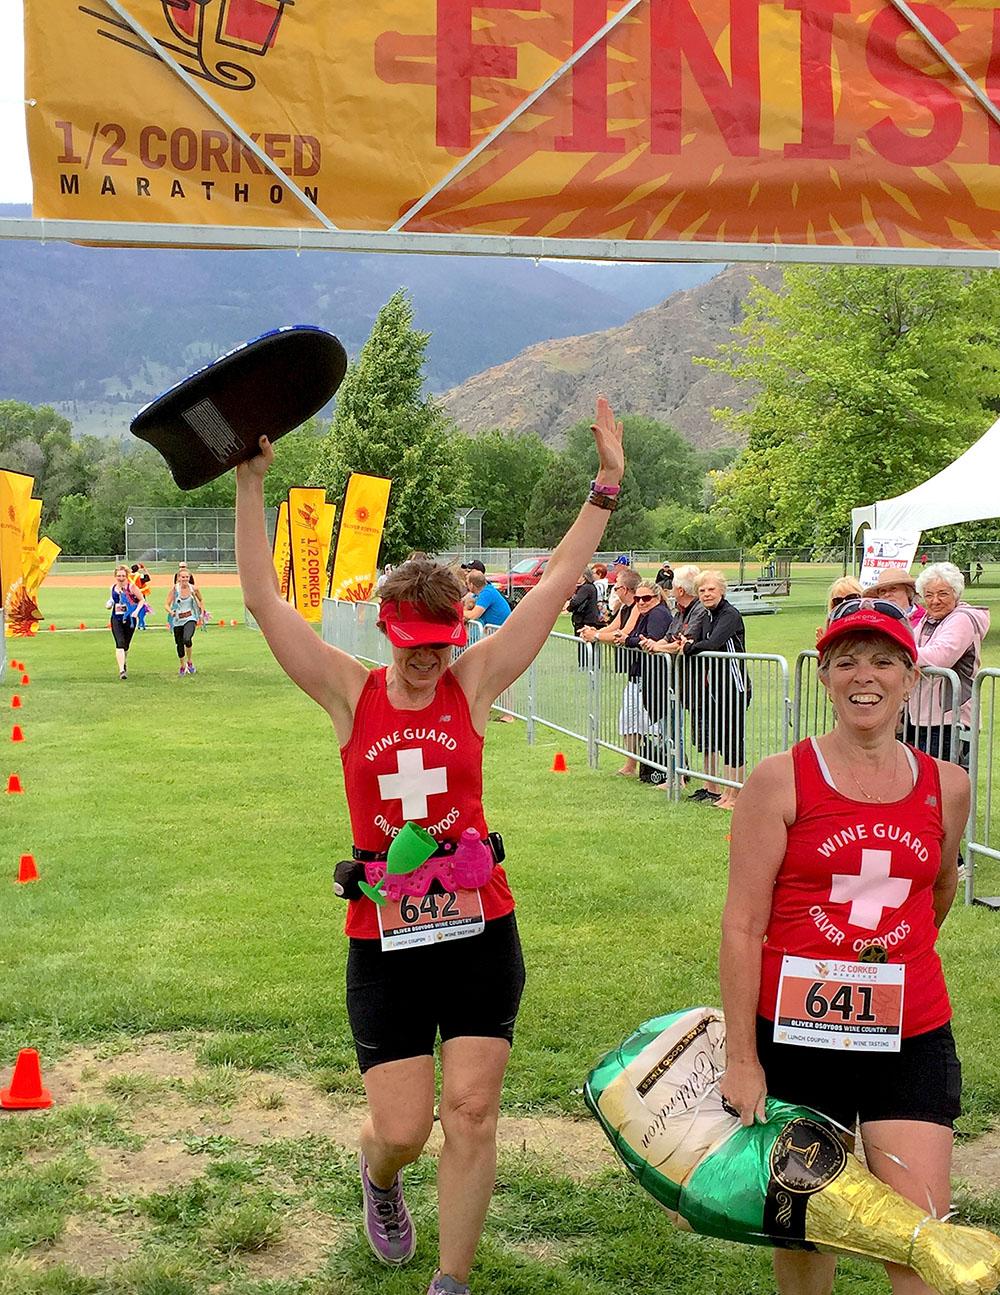 Crossing the finish line at the Half-Corked Marathon (Adrian Brijbassi)